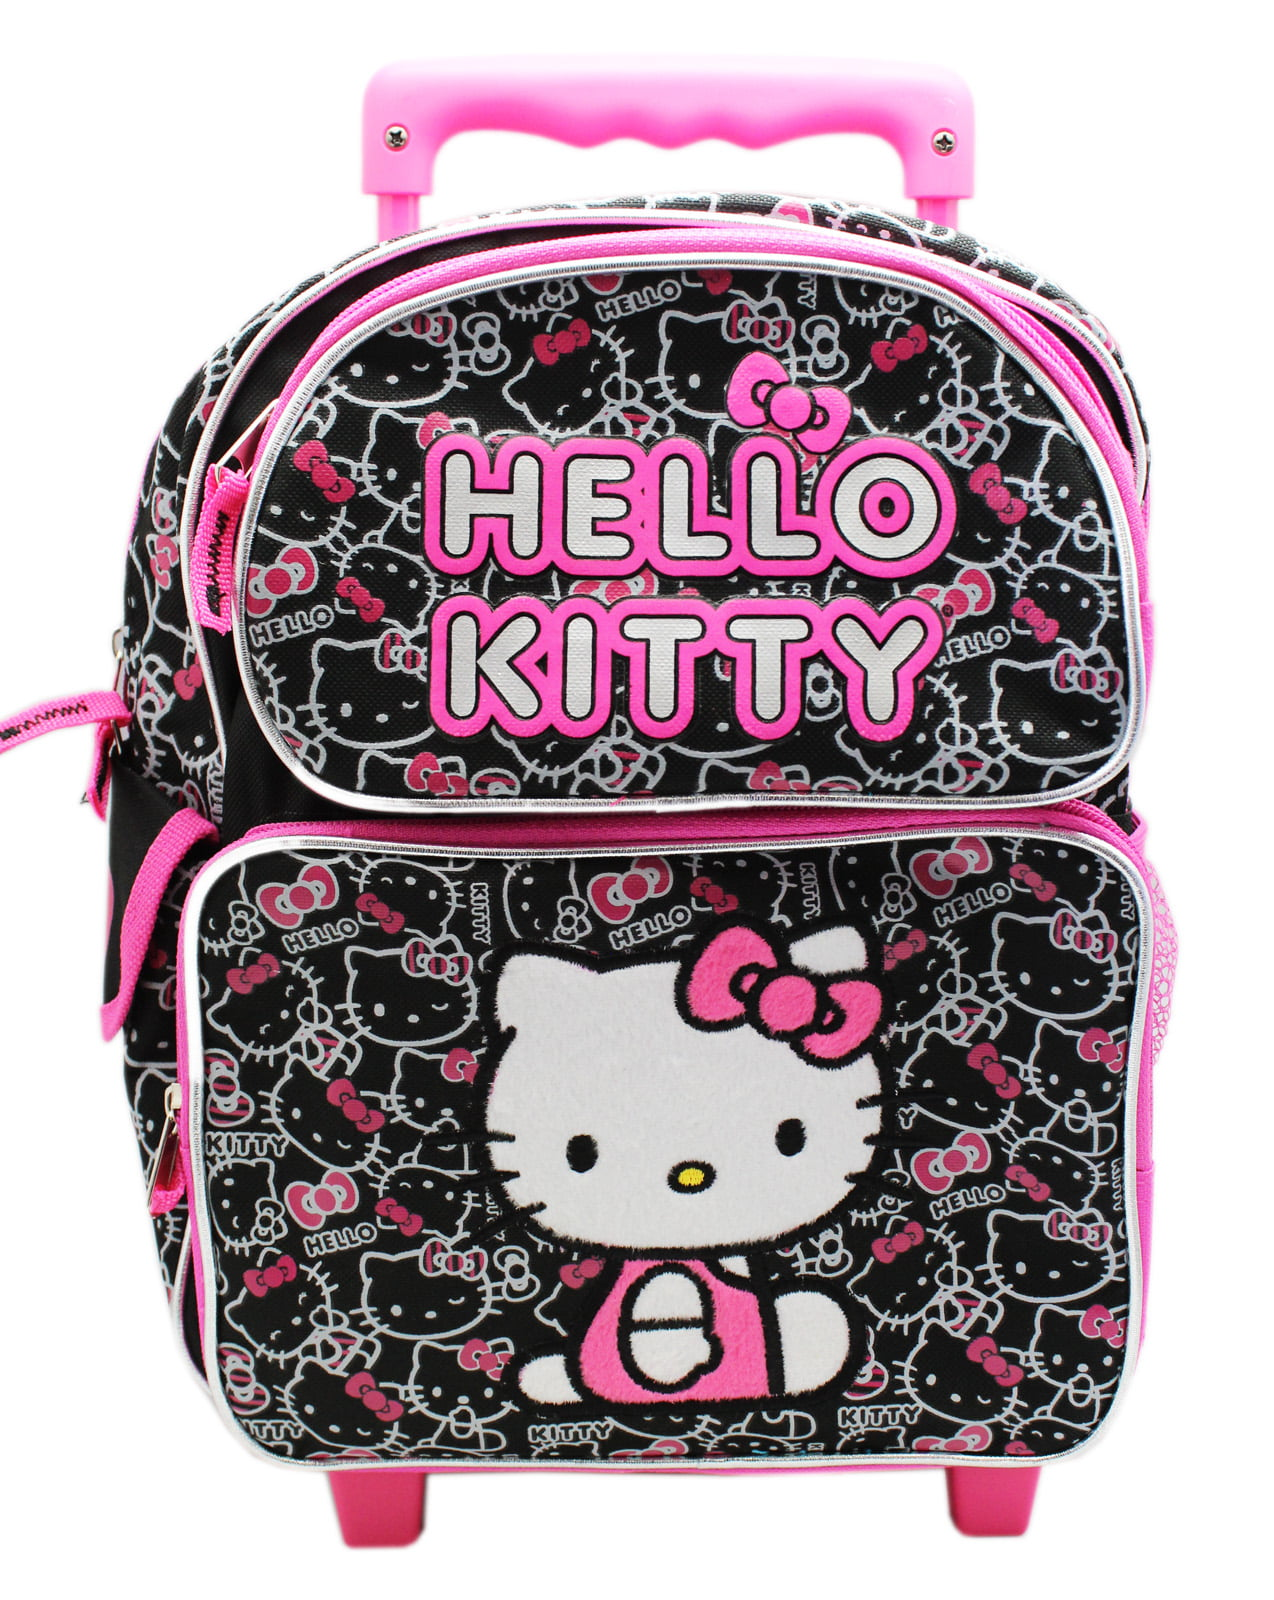 1331b88adbd6 Sanrio - Hello Kitty Pink Black Face Pattern Preschooler Rolling Backpack  (12in) - Walmart.com